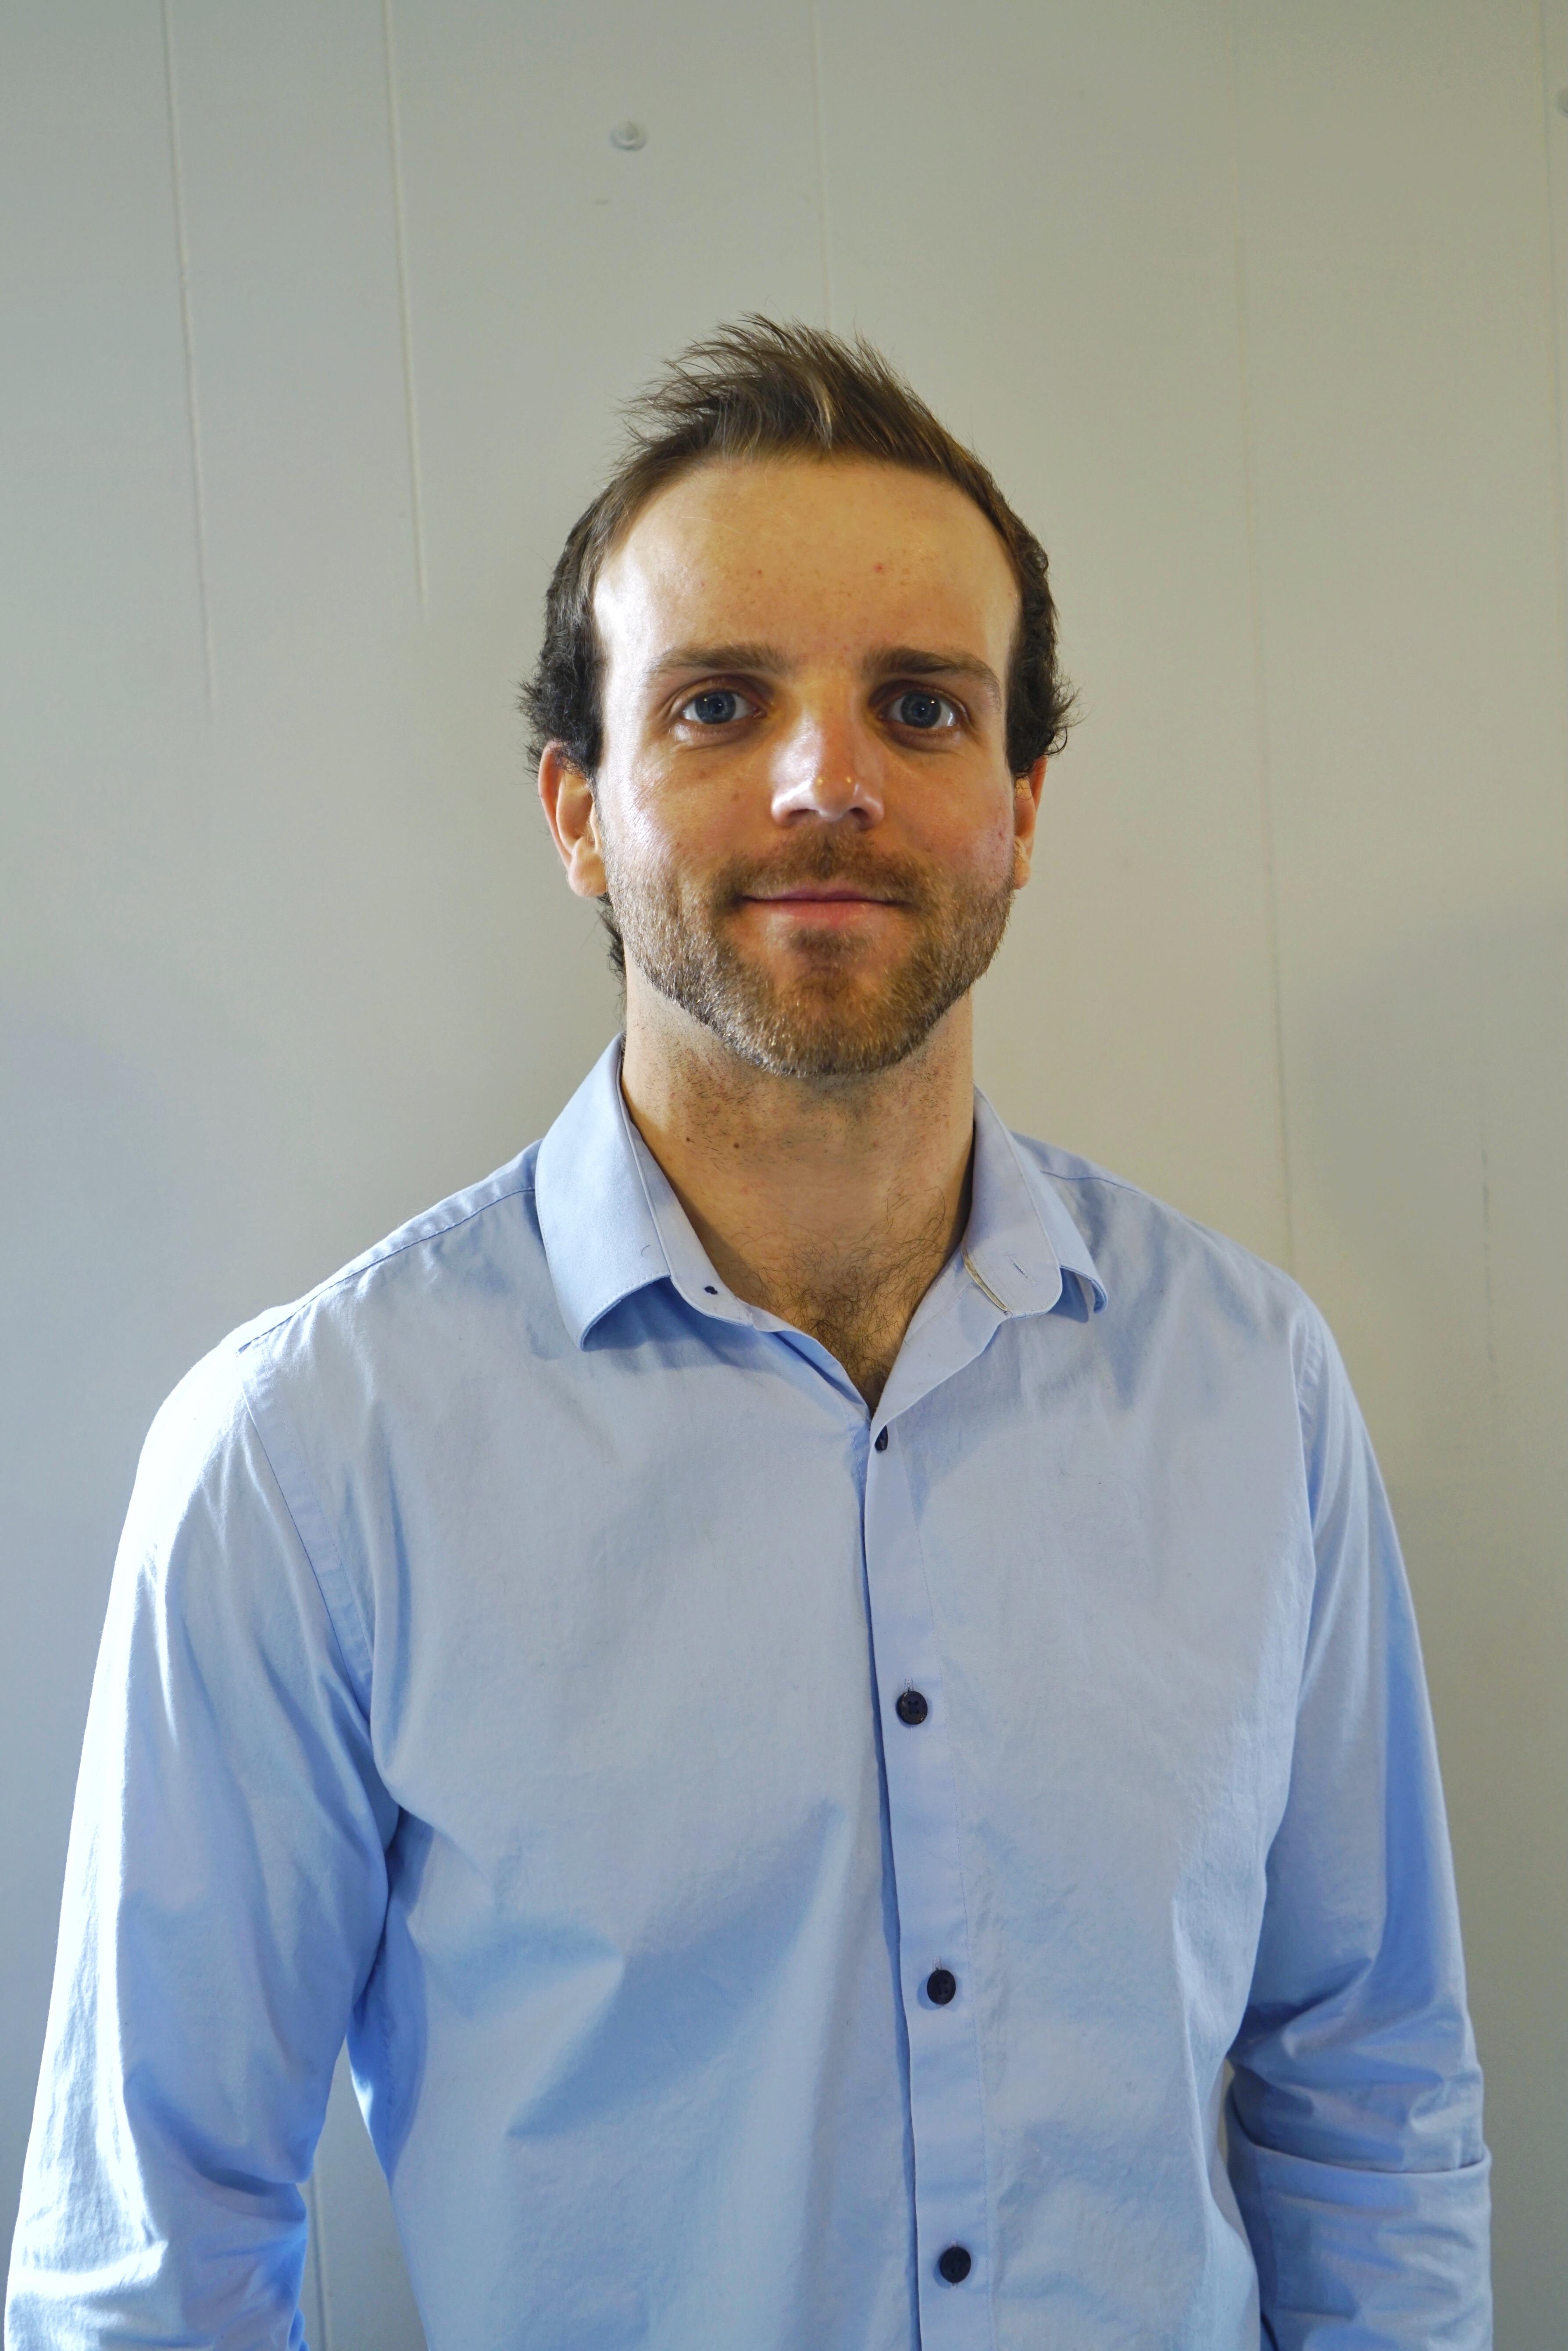 Tanner Shapton_Civil Engineer in Training